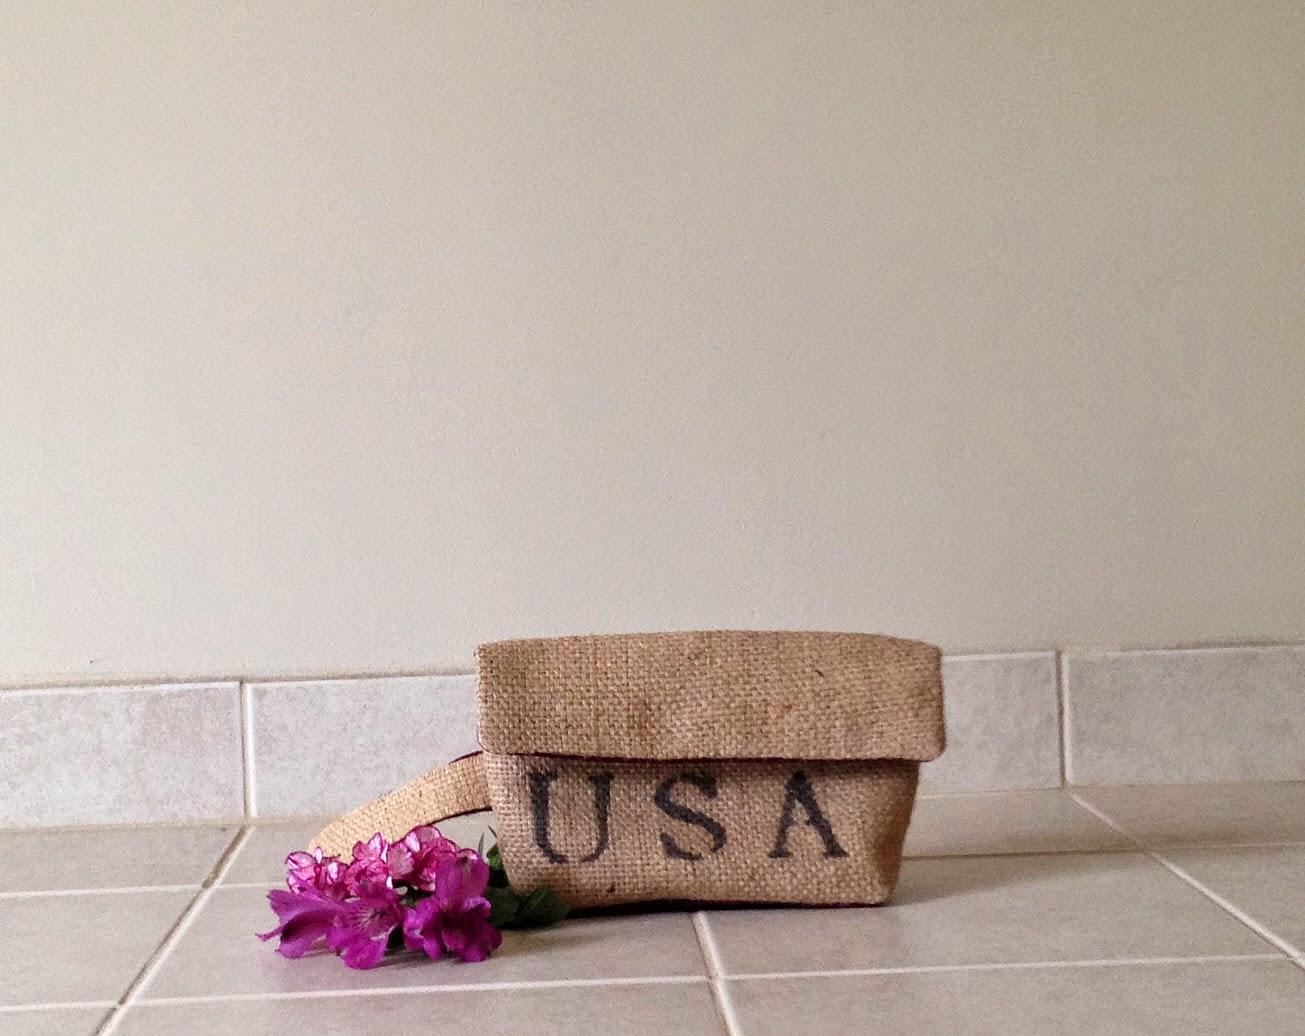 USA clutch - linaandvi.blogspot.com